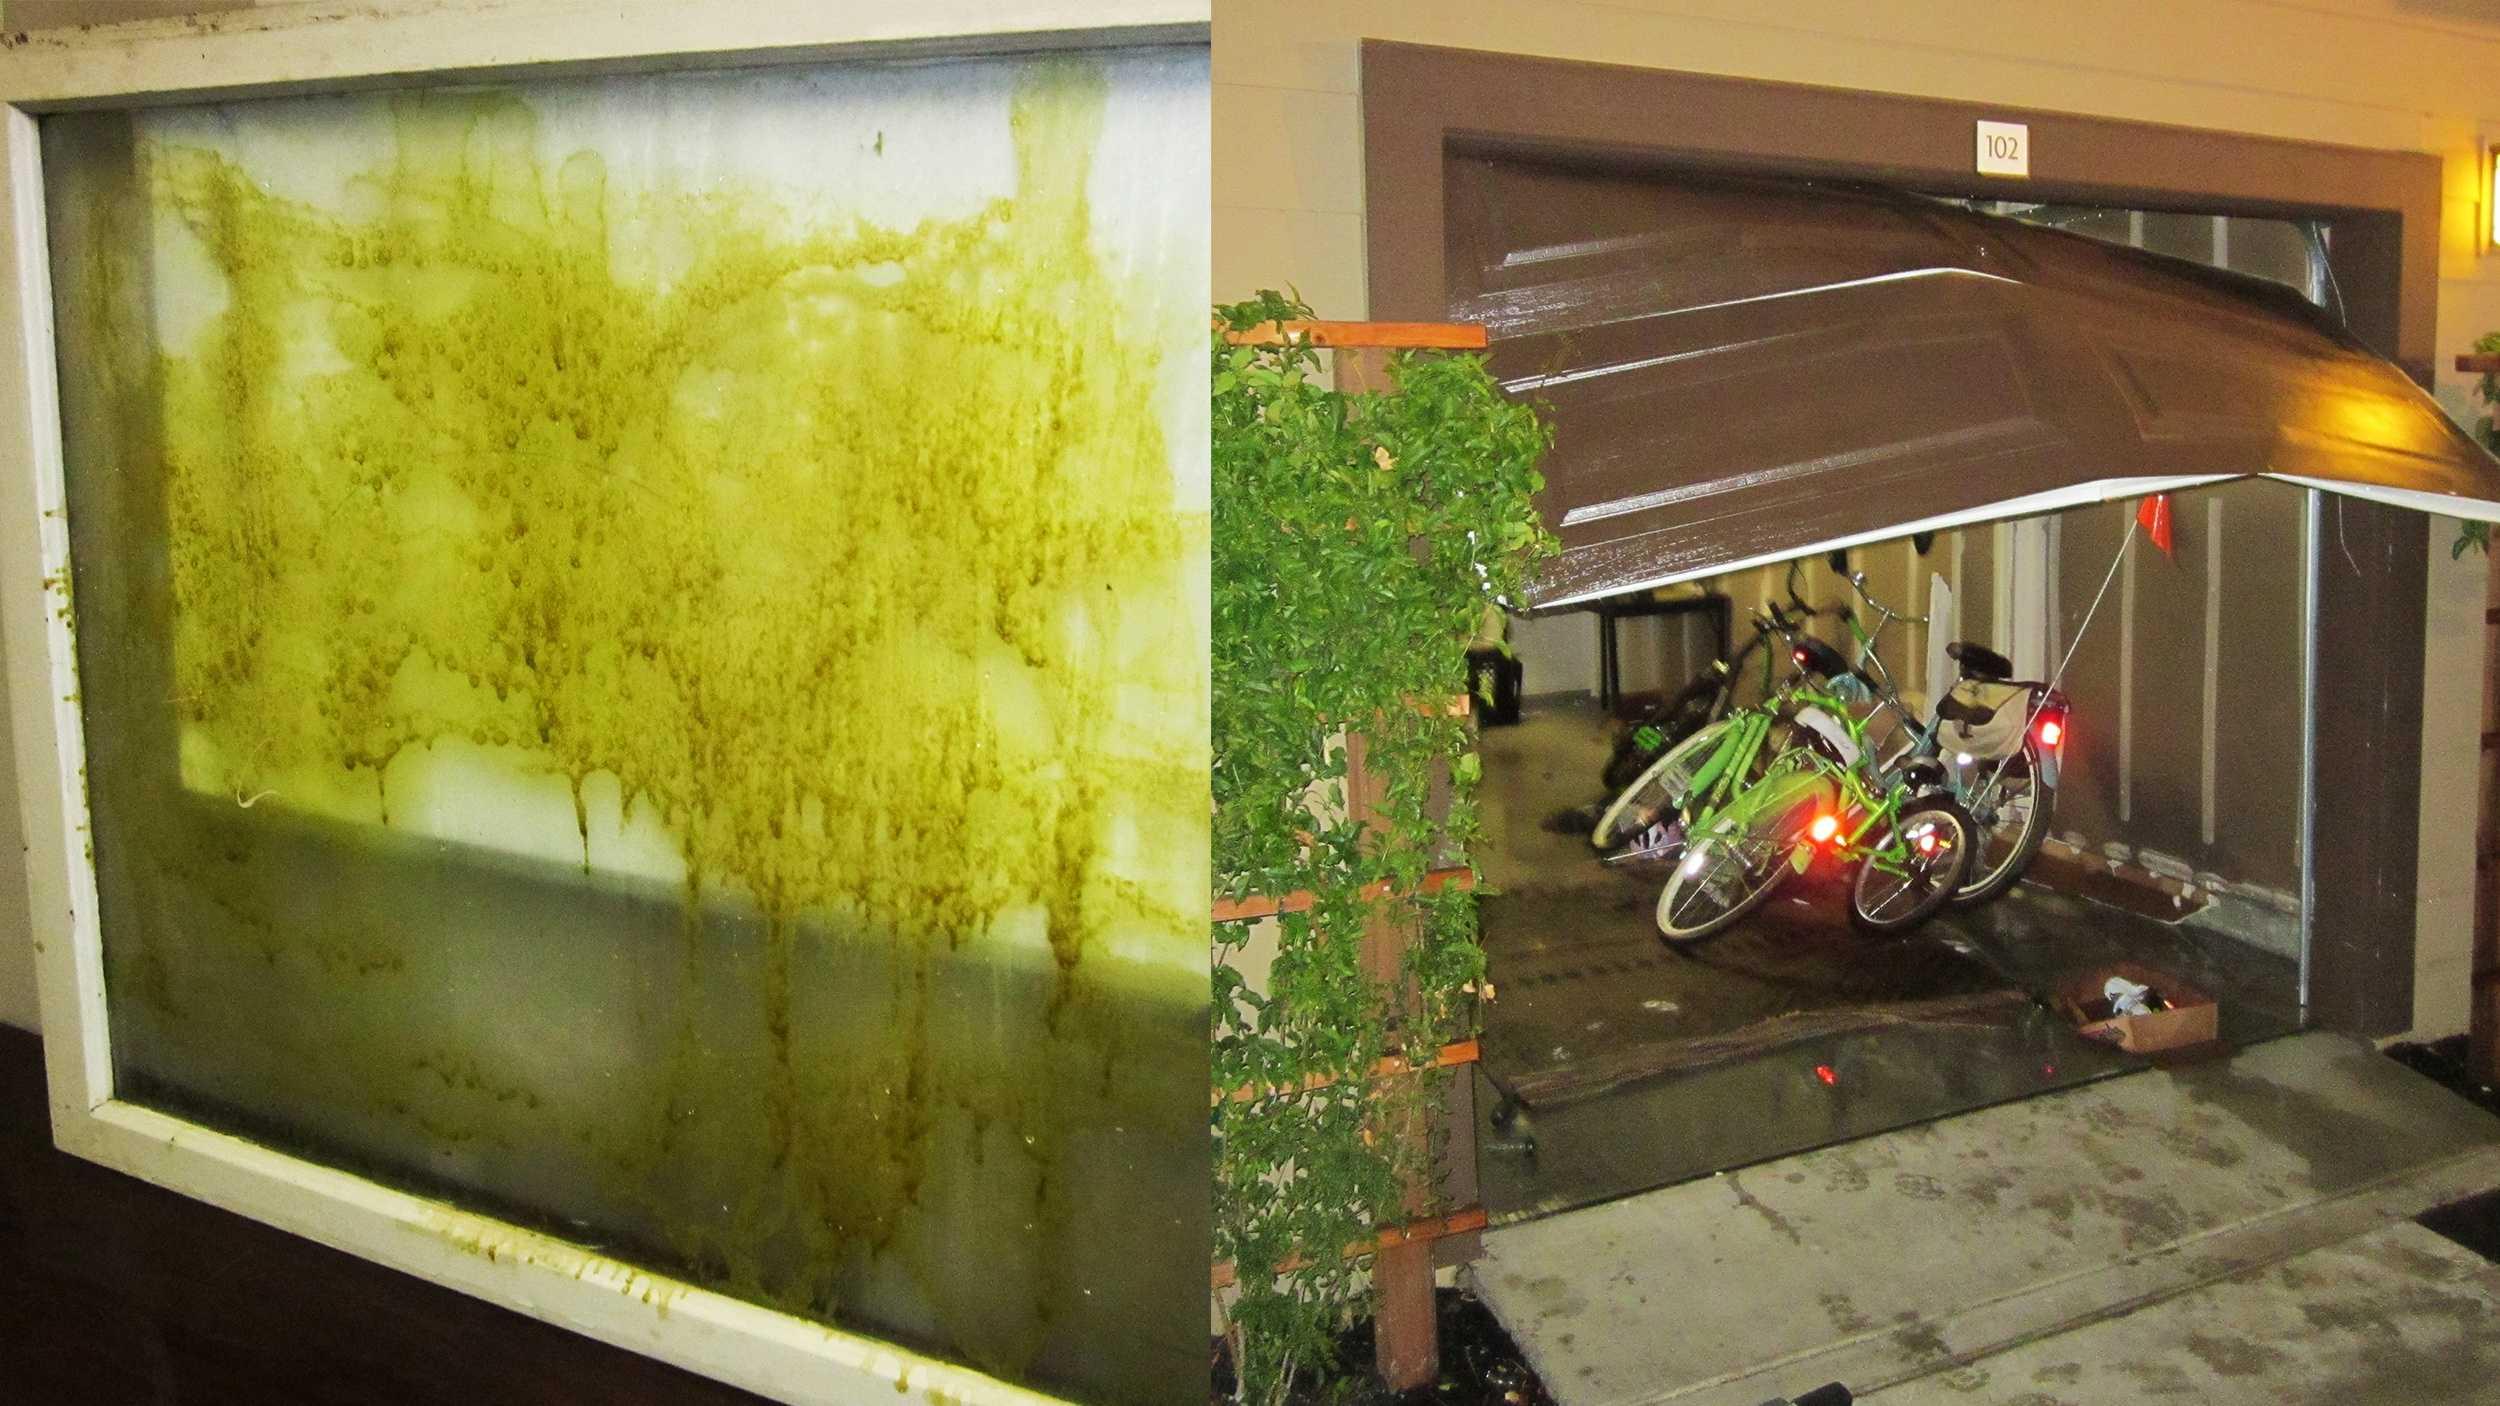 Santa Cruz hash oil lab